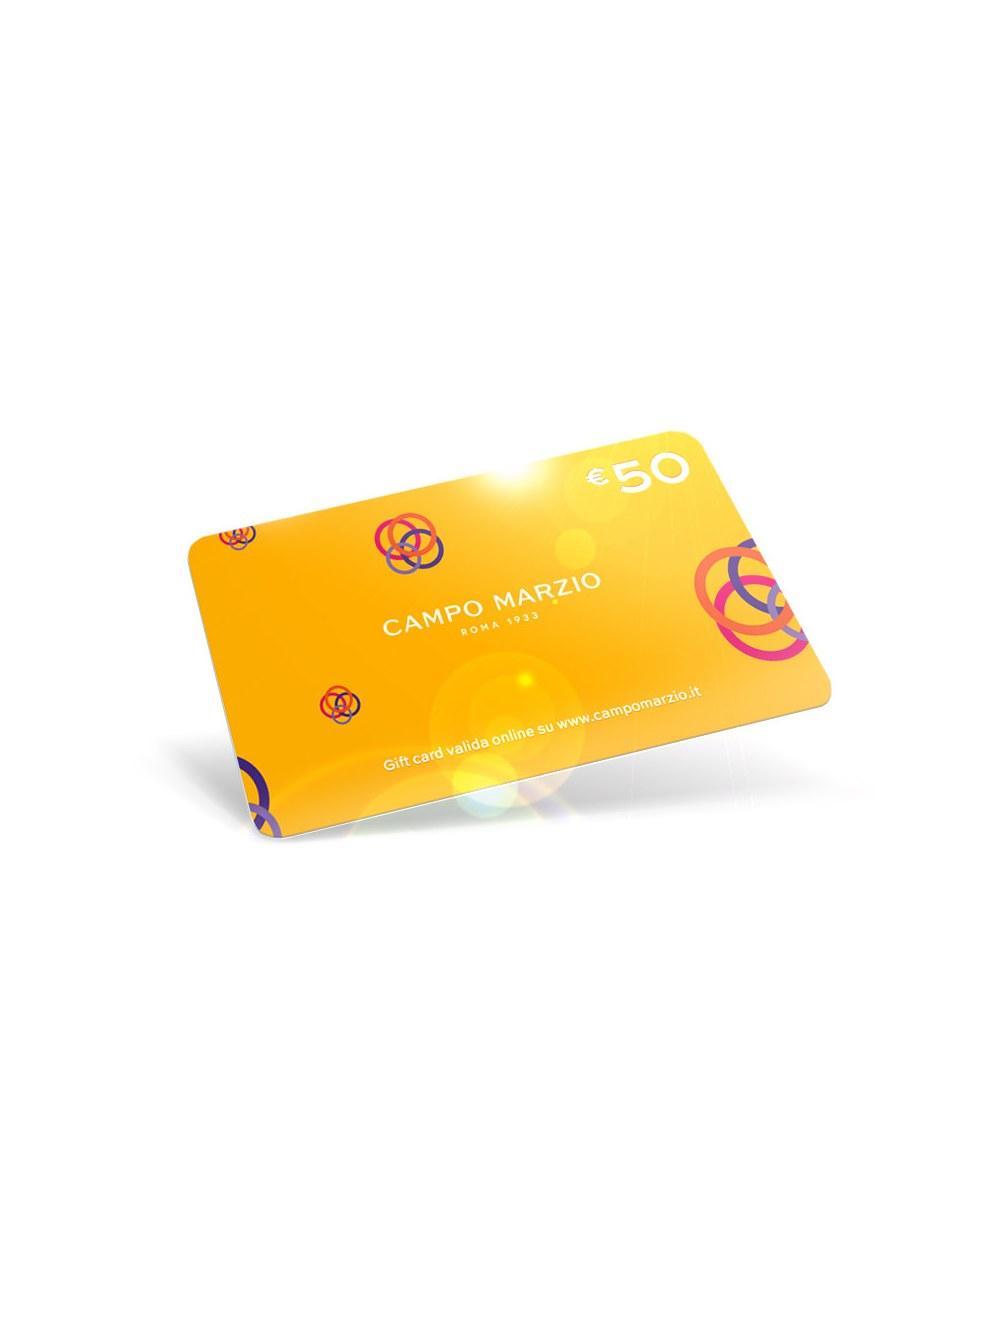 Gift Card $68